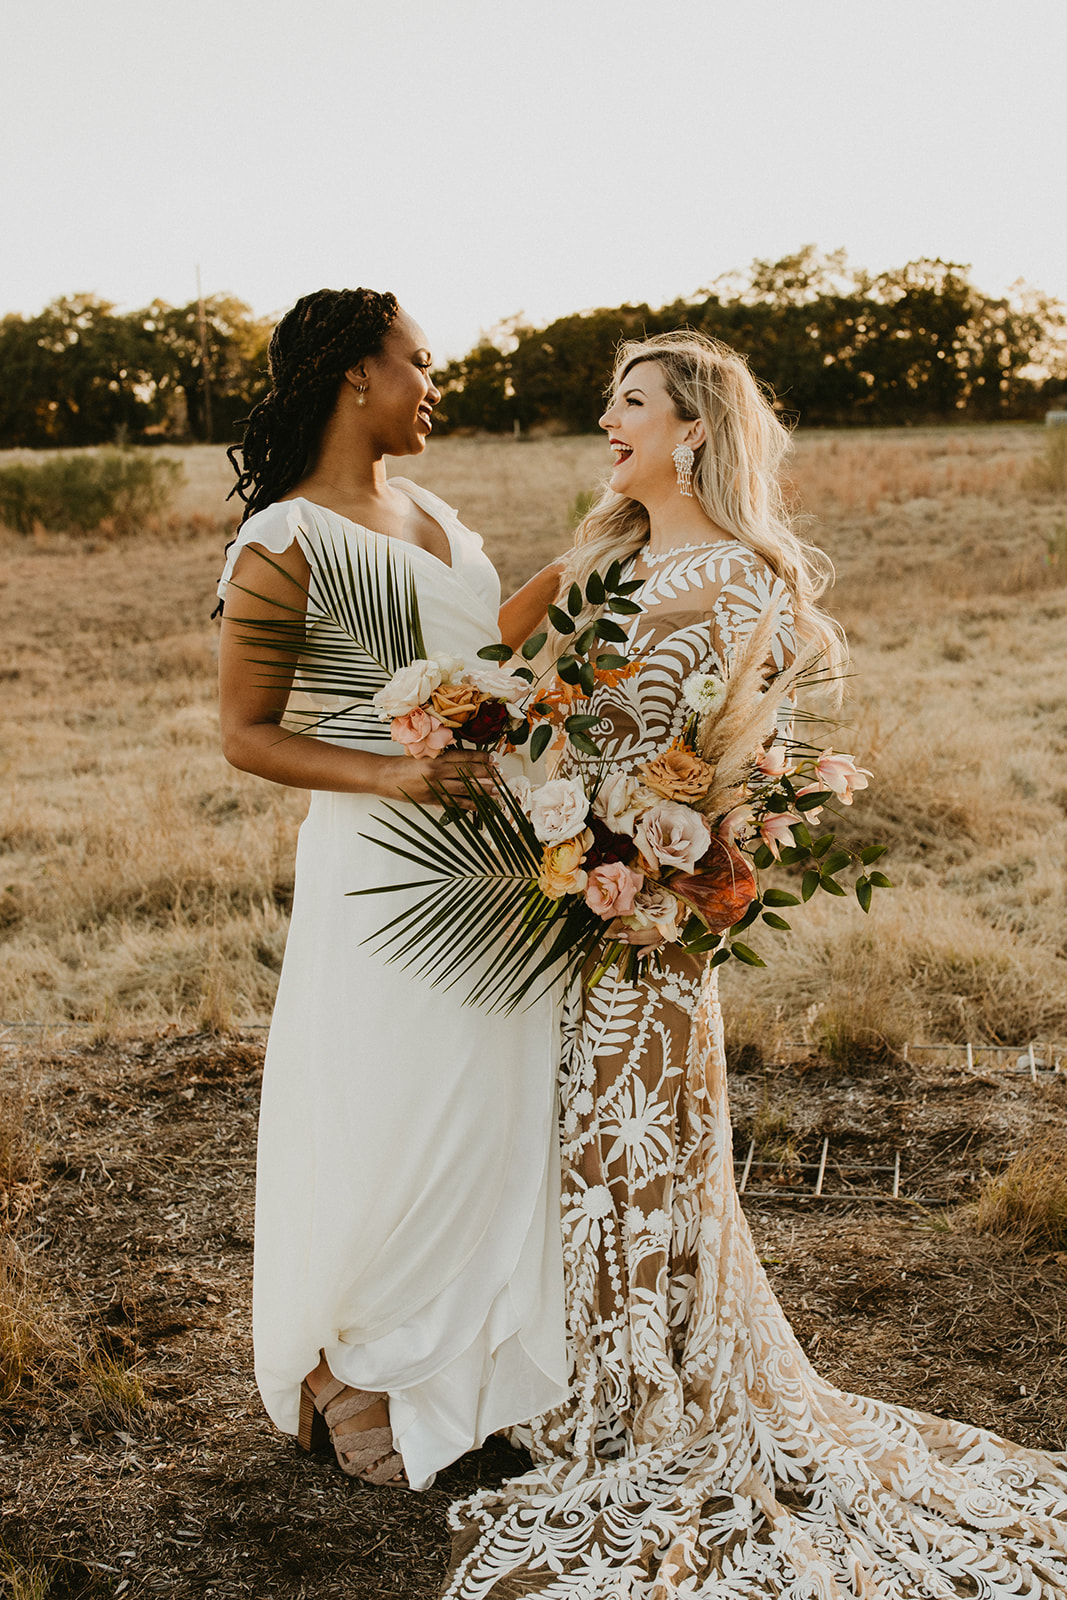 Tropical Colorful Frond Bridesmaid + Bride Bouquets + White Creamy Bridesmaid Dresses + Rue De Seine Wedding Dress + Boho Wedding + Planner Epoch Co+